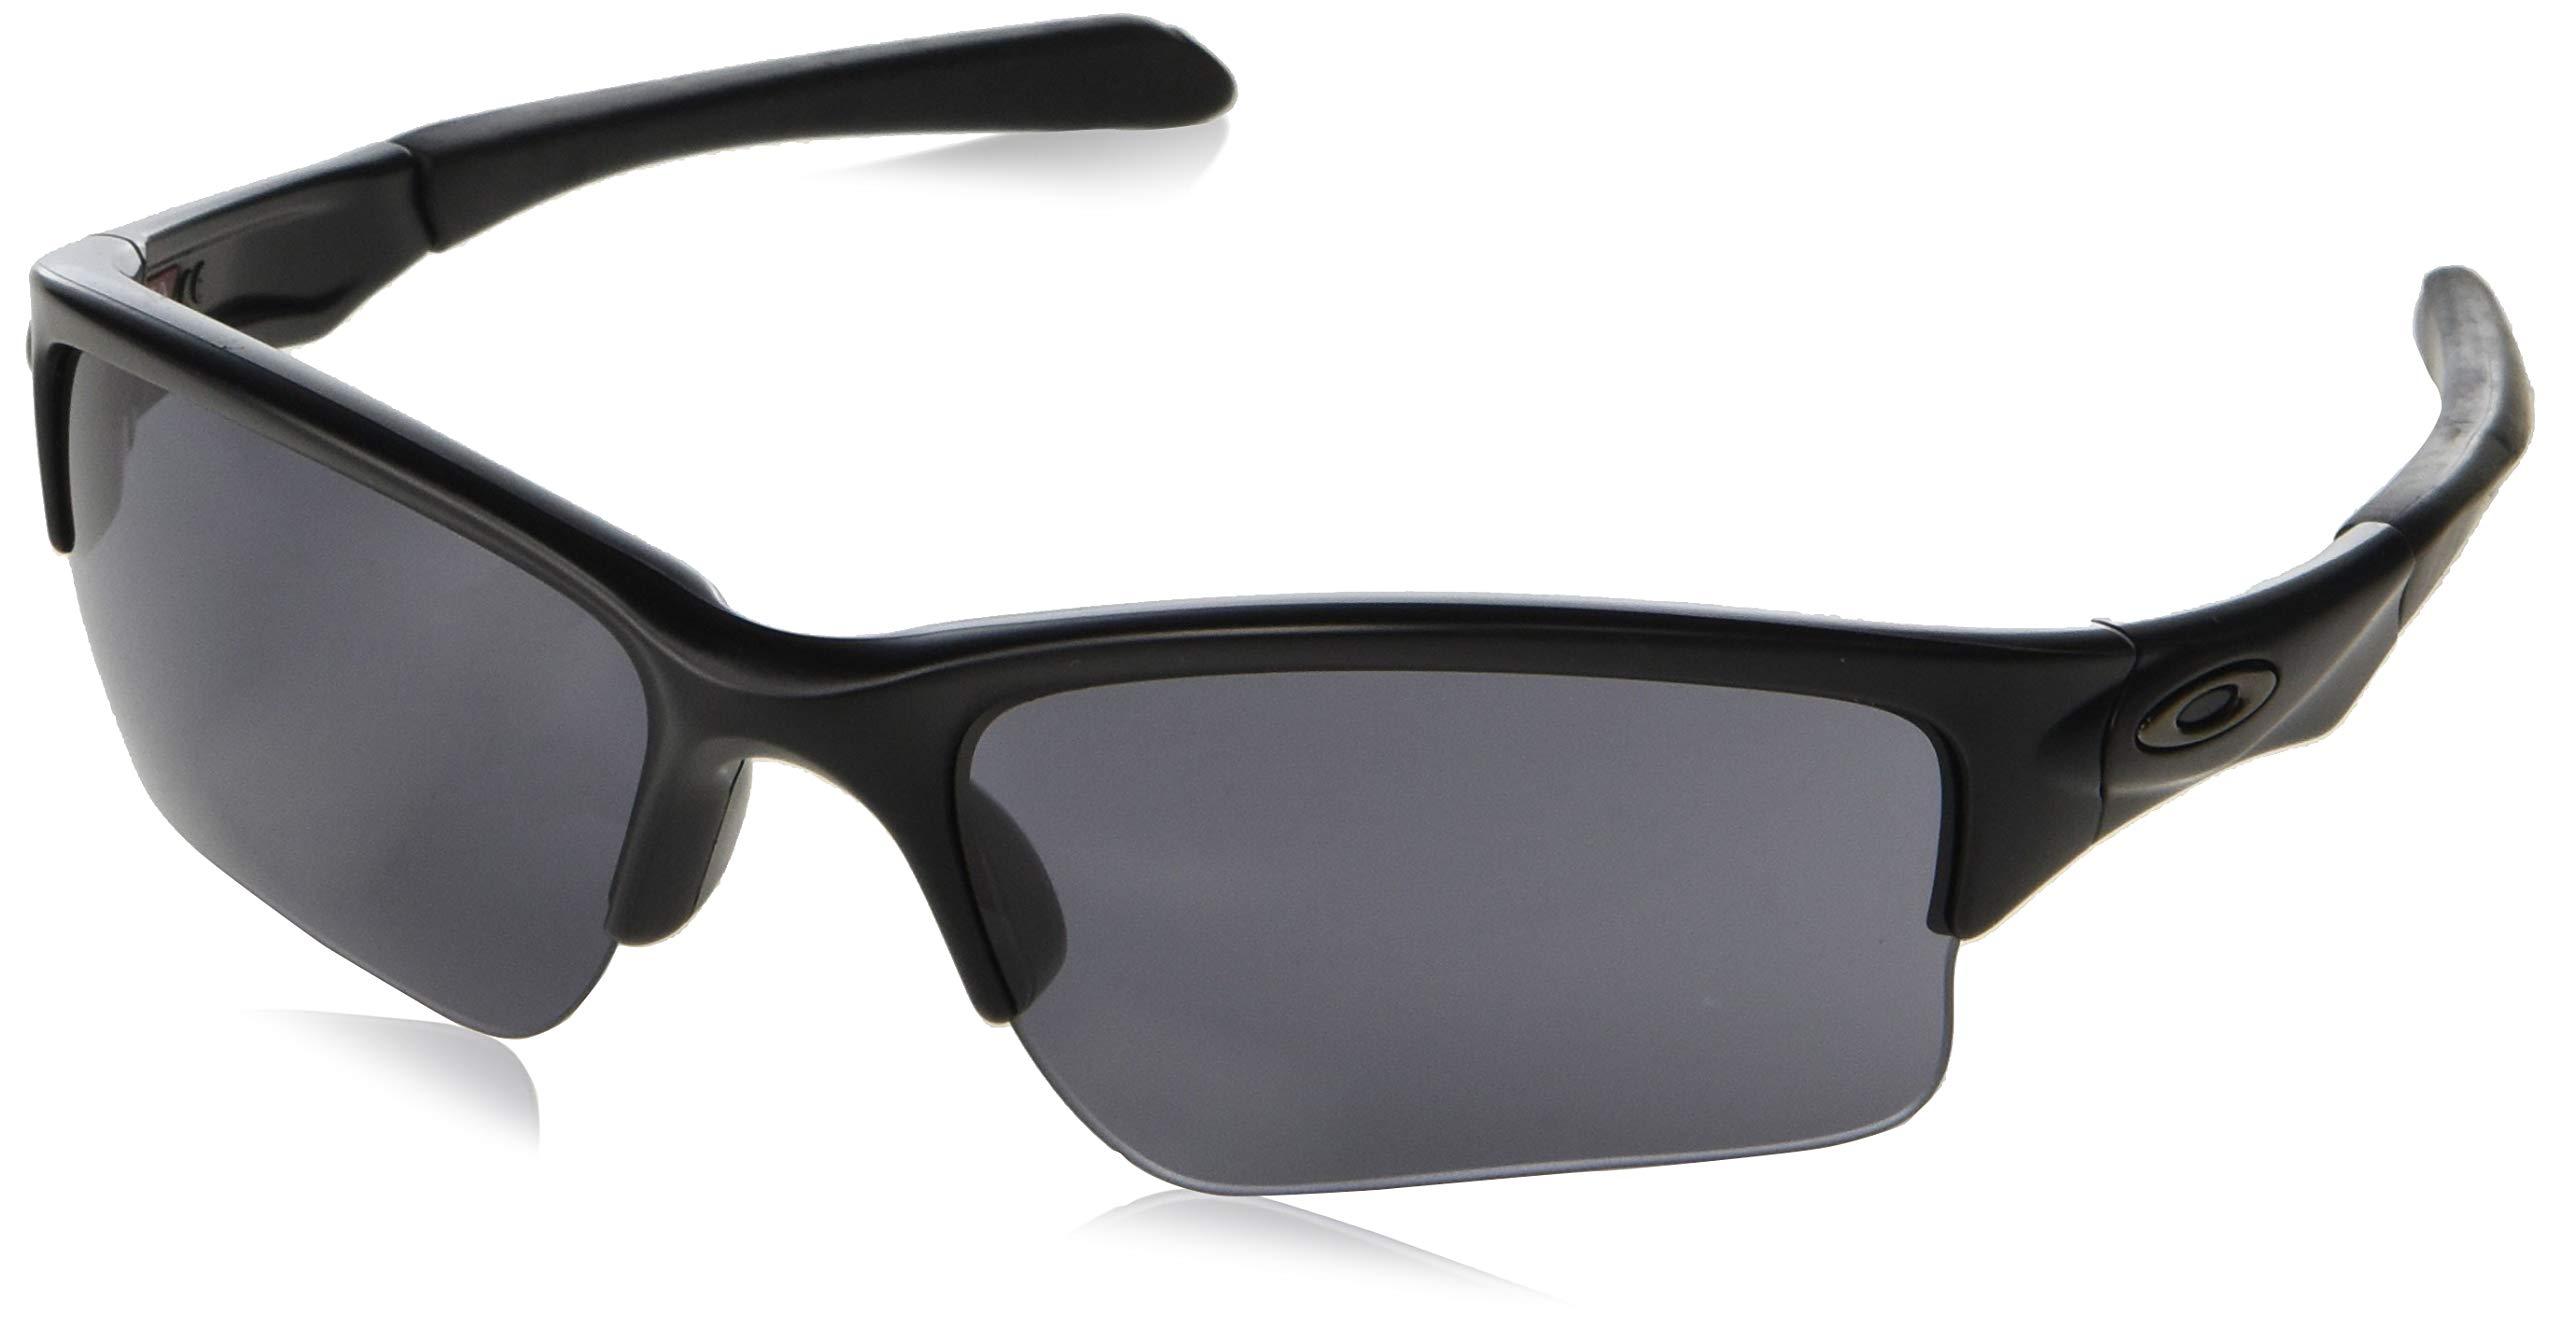 Oakley Men's OO9200 Quarter Jacket Rectangular Sunglasses, Matte Black/Grey, 61 mm by Oakley